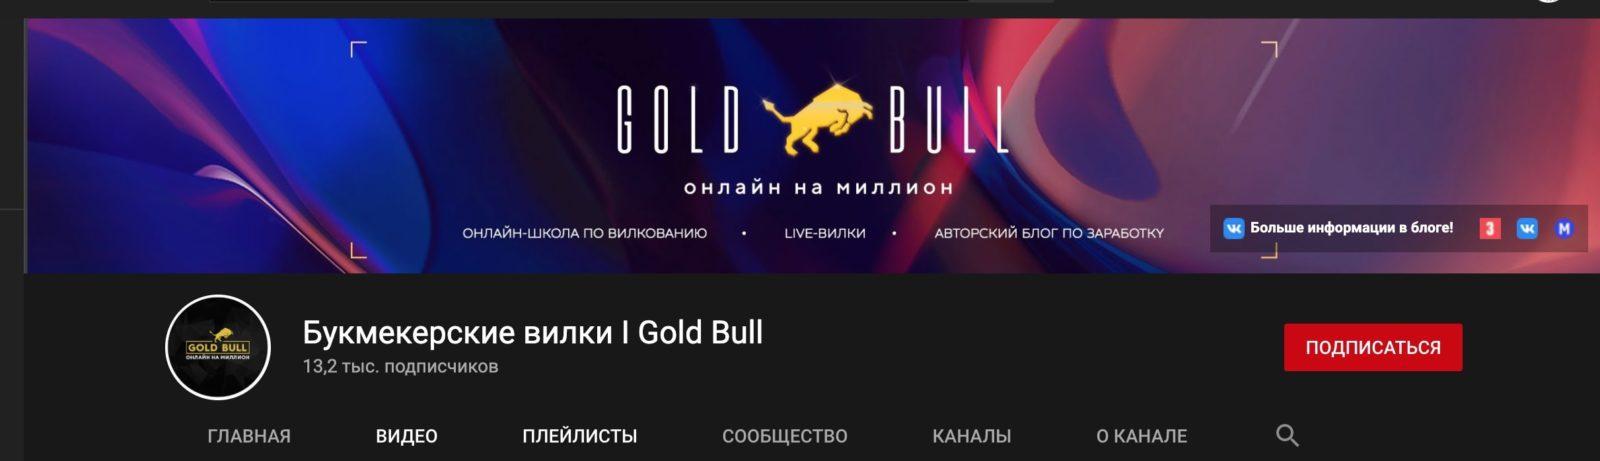 Ютуб канал Gold Bull